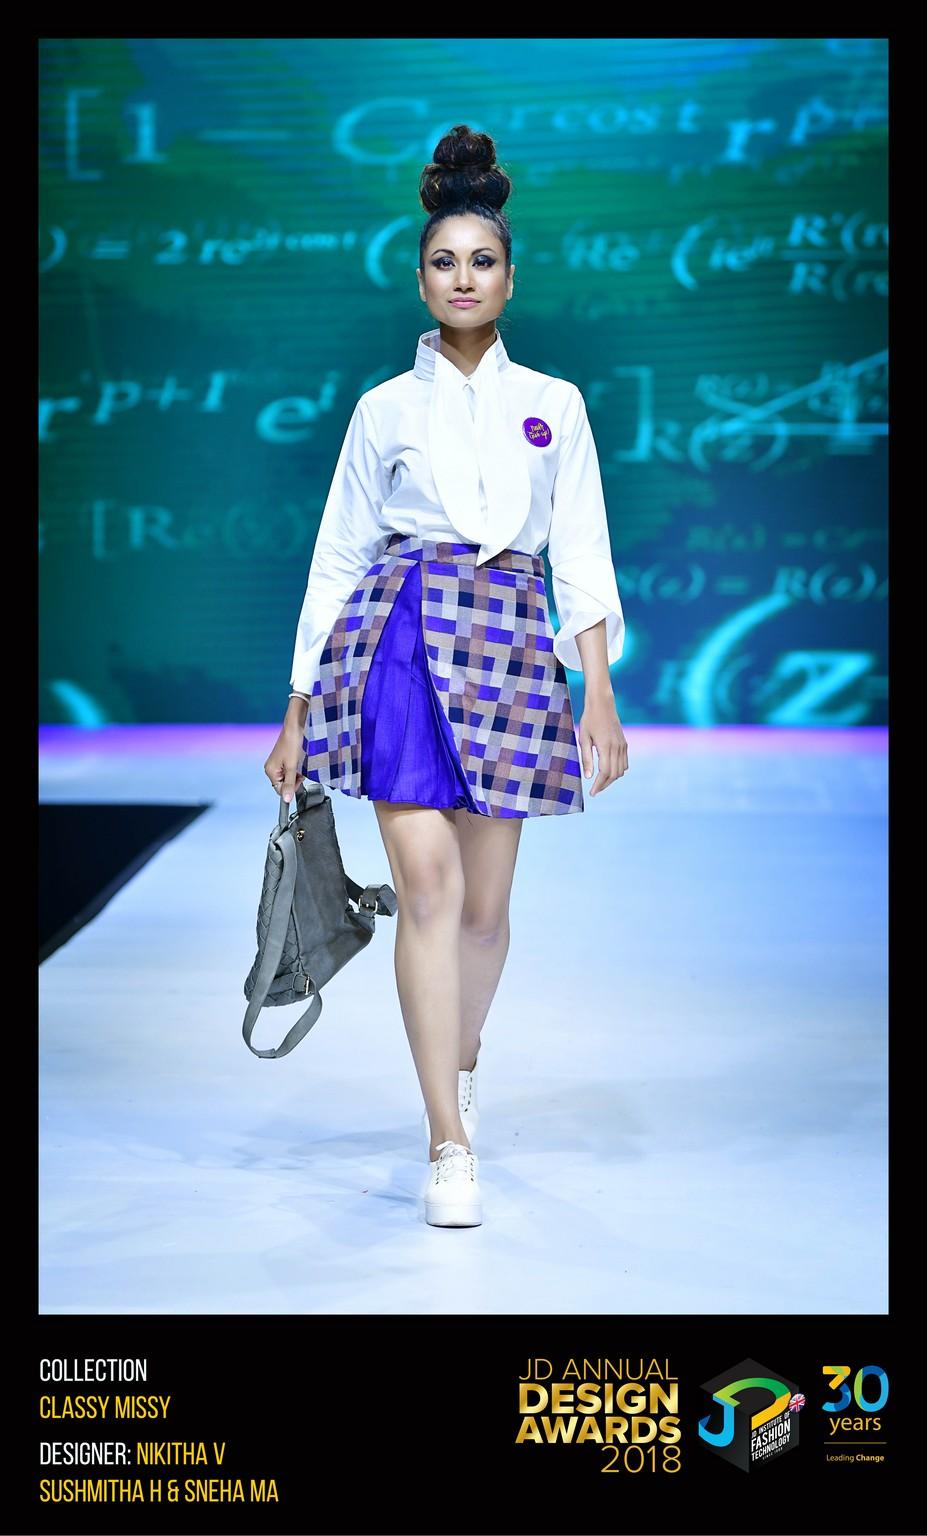 Classy Missy – Change – JD Annual Design Awards 2018 | Designer: Sneha, Nikita and Sushmita | Photography : Jerin Nath (@jerin_nath) classy missy – change – jd annual design awards 2018 - CLASSY MISSY 5 - Classy Missy – Change – JD Annual Design Awards 2018